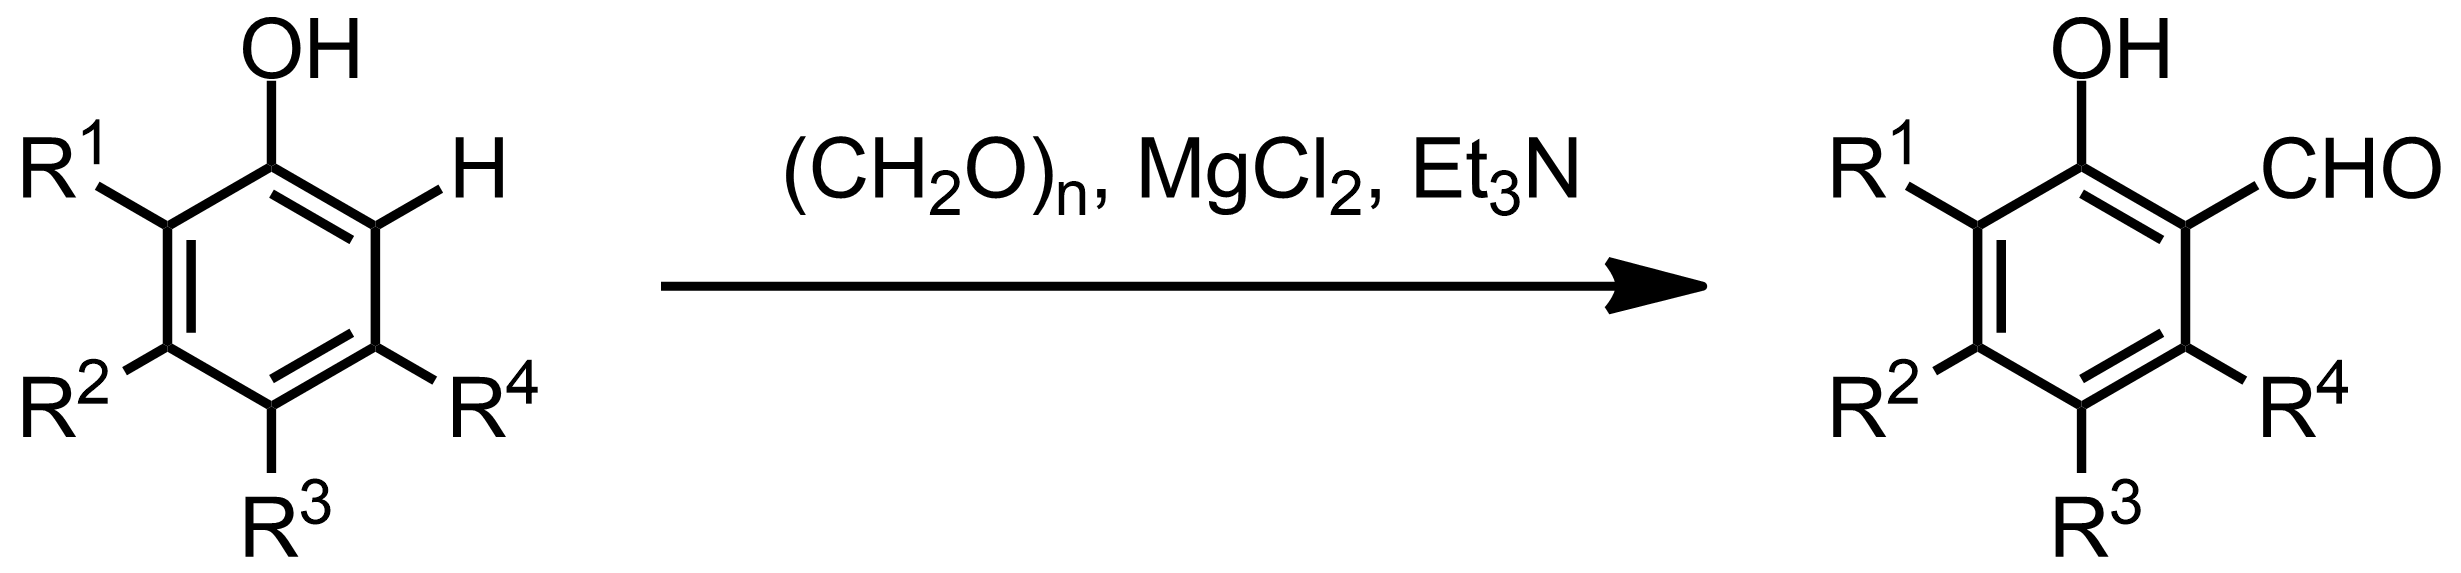 Schematic representation of the Casnati-Skattebøl Formylation.